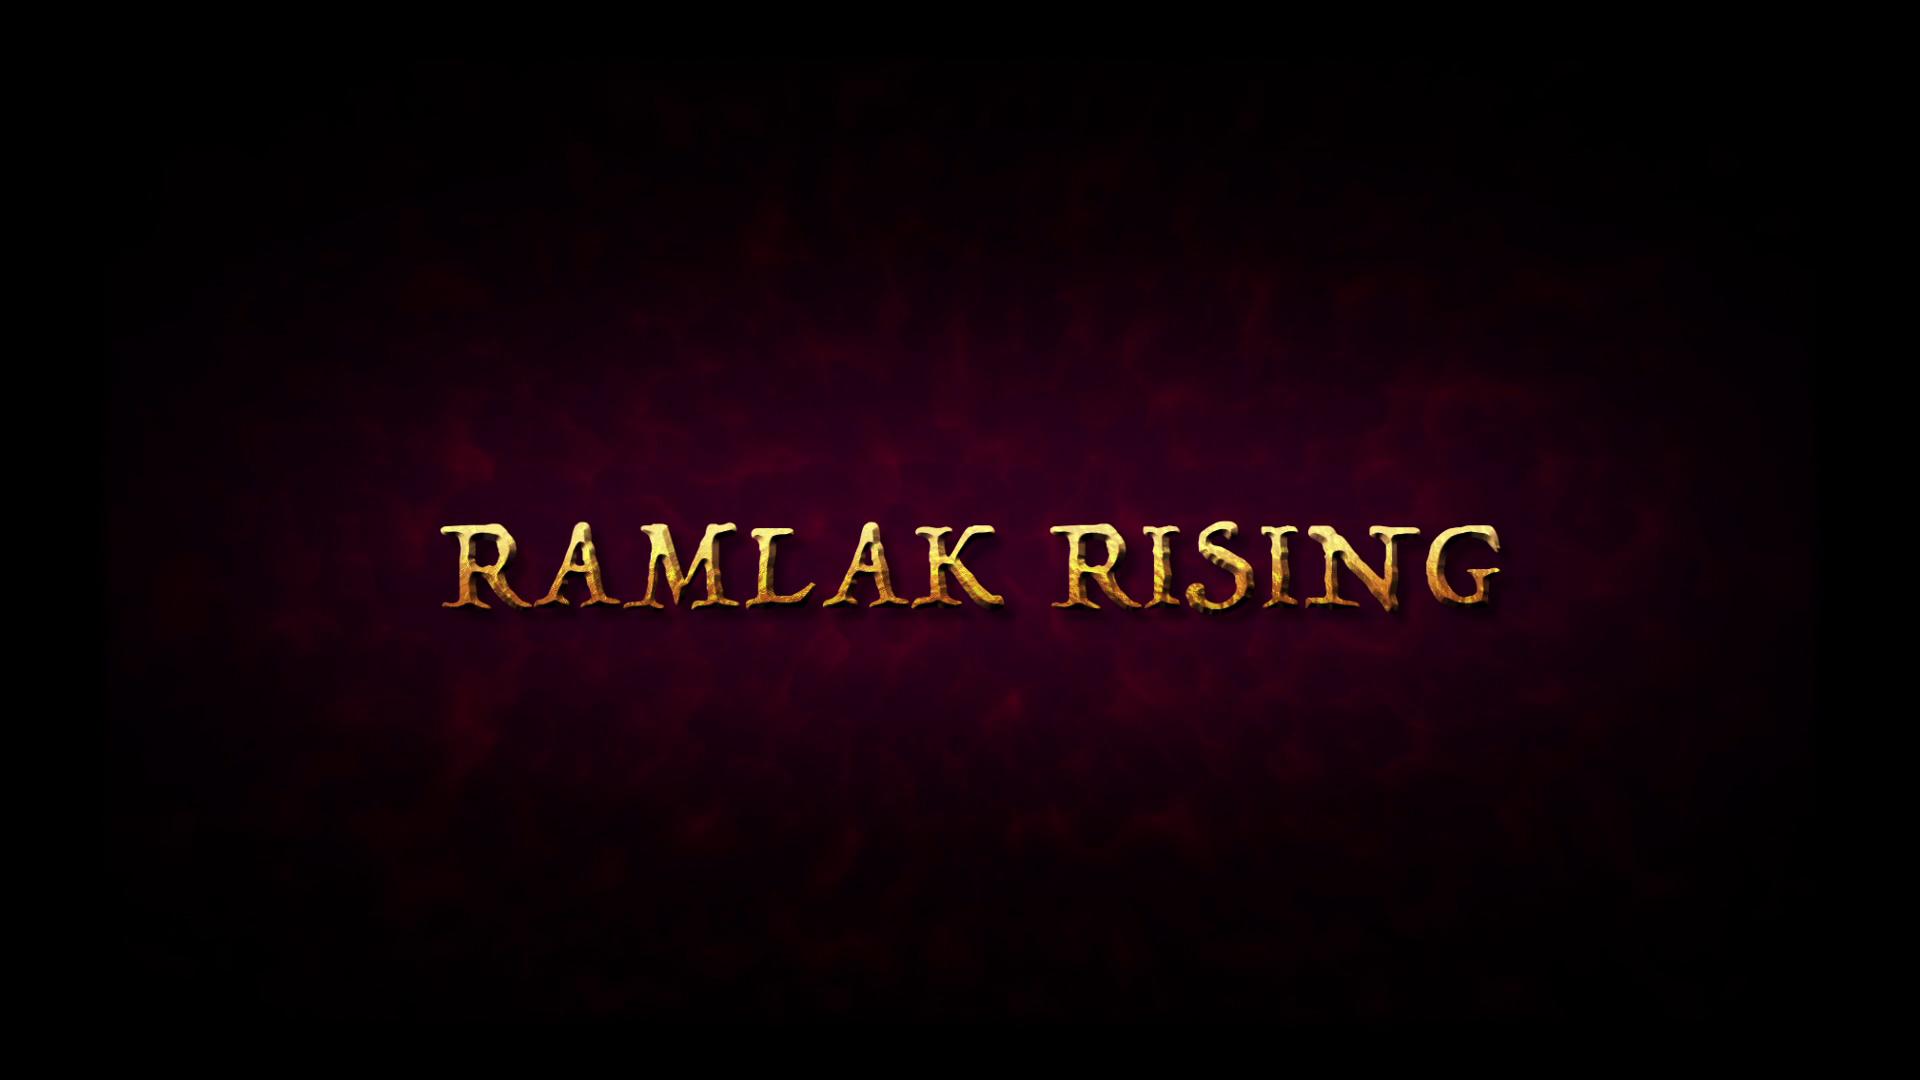 Ramlak Rising